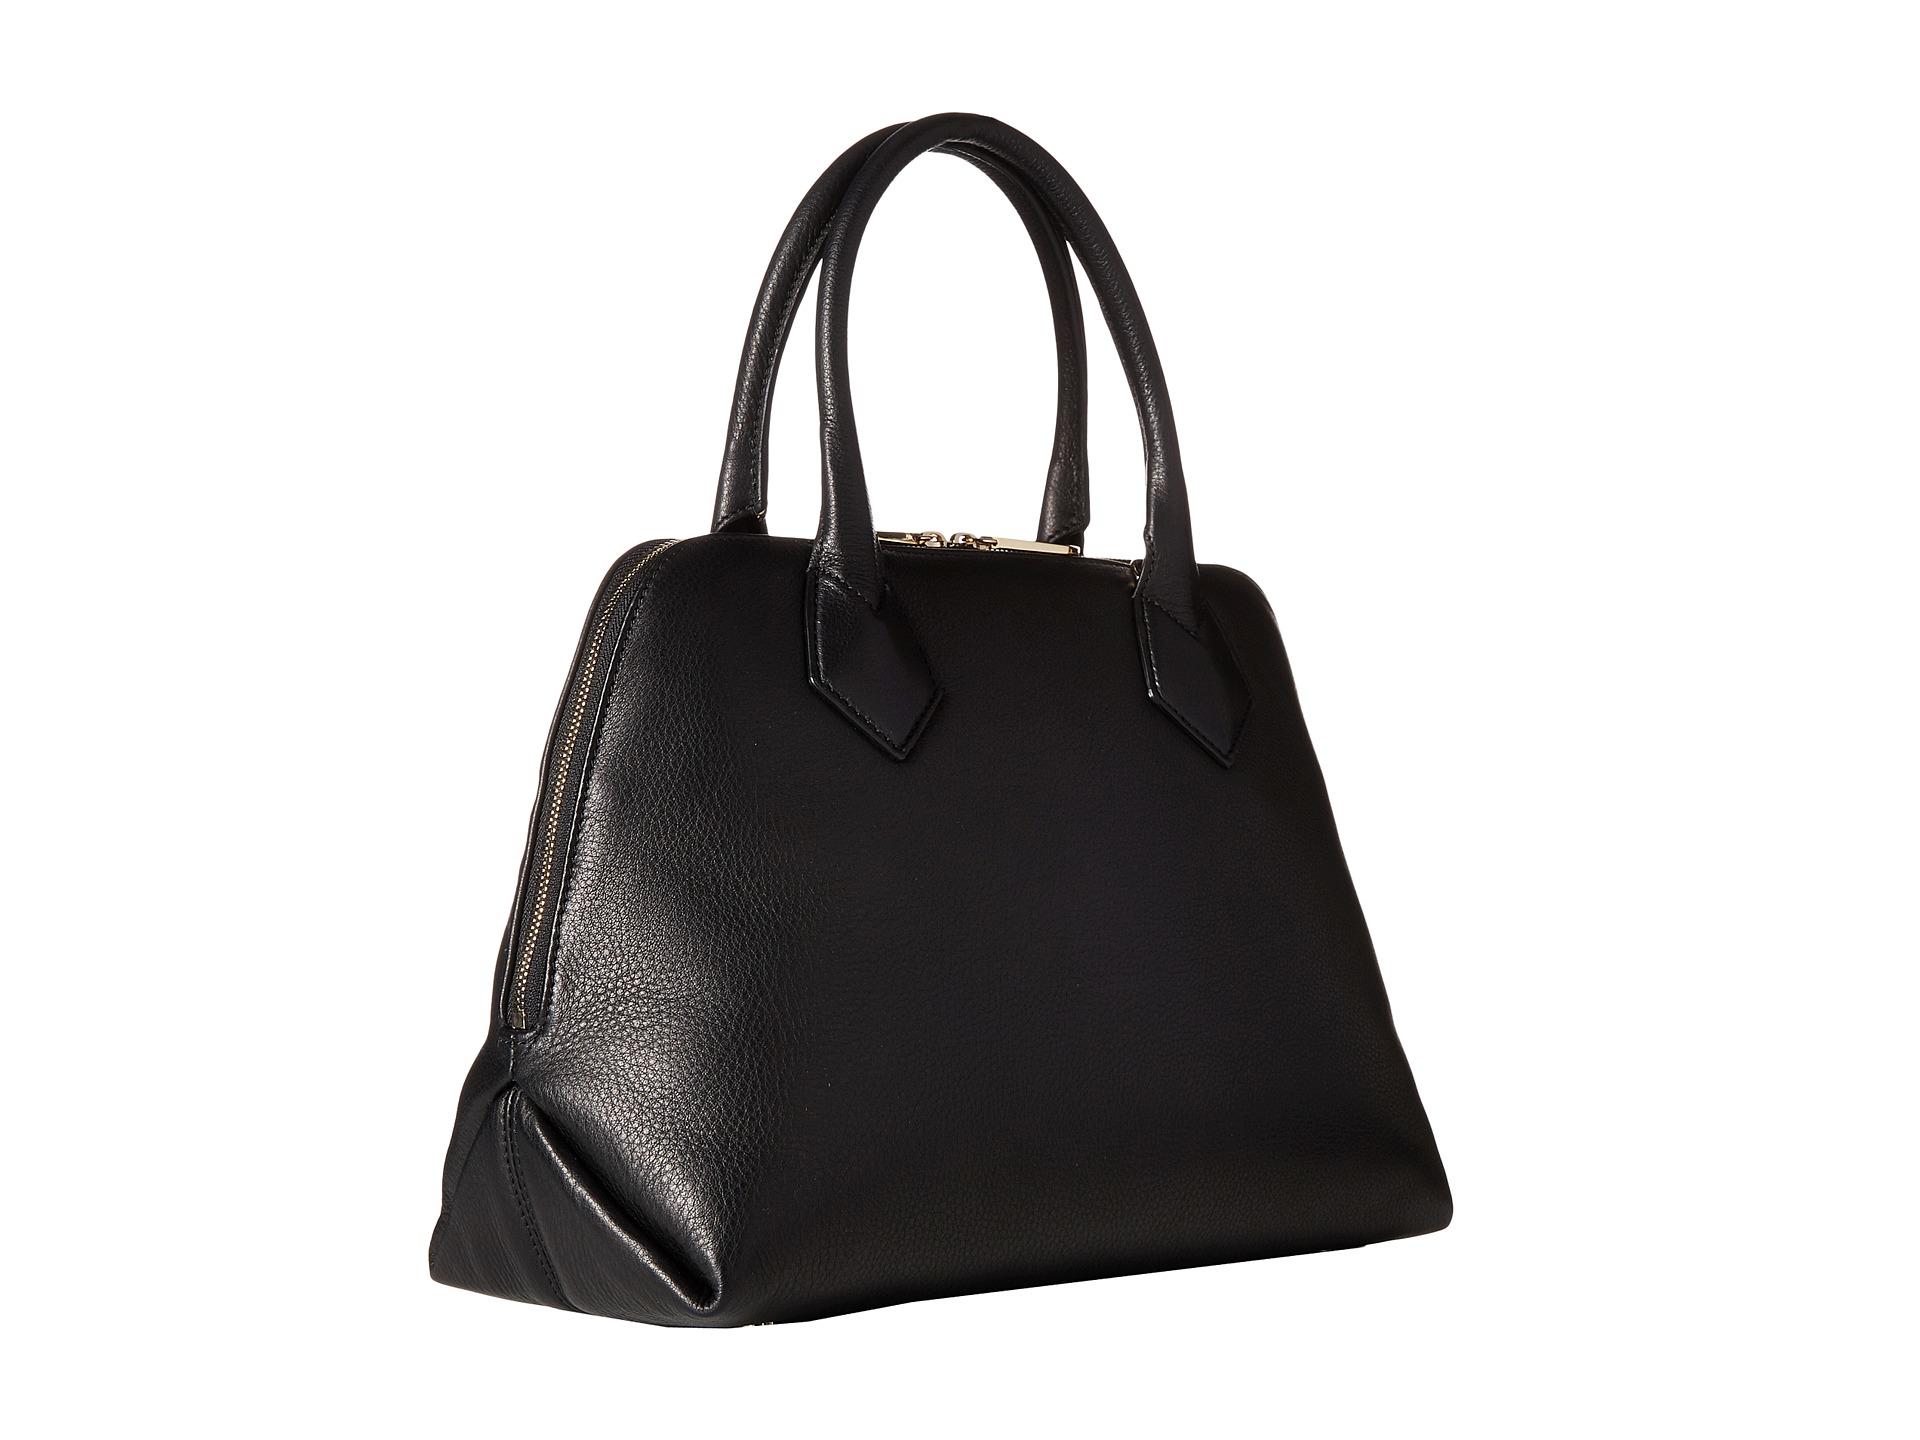 1108ddd2a5 Vivienne Westwood Spencer Handbag in Black - Lyst